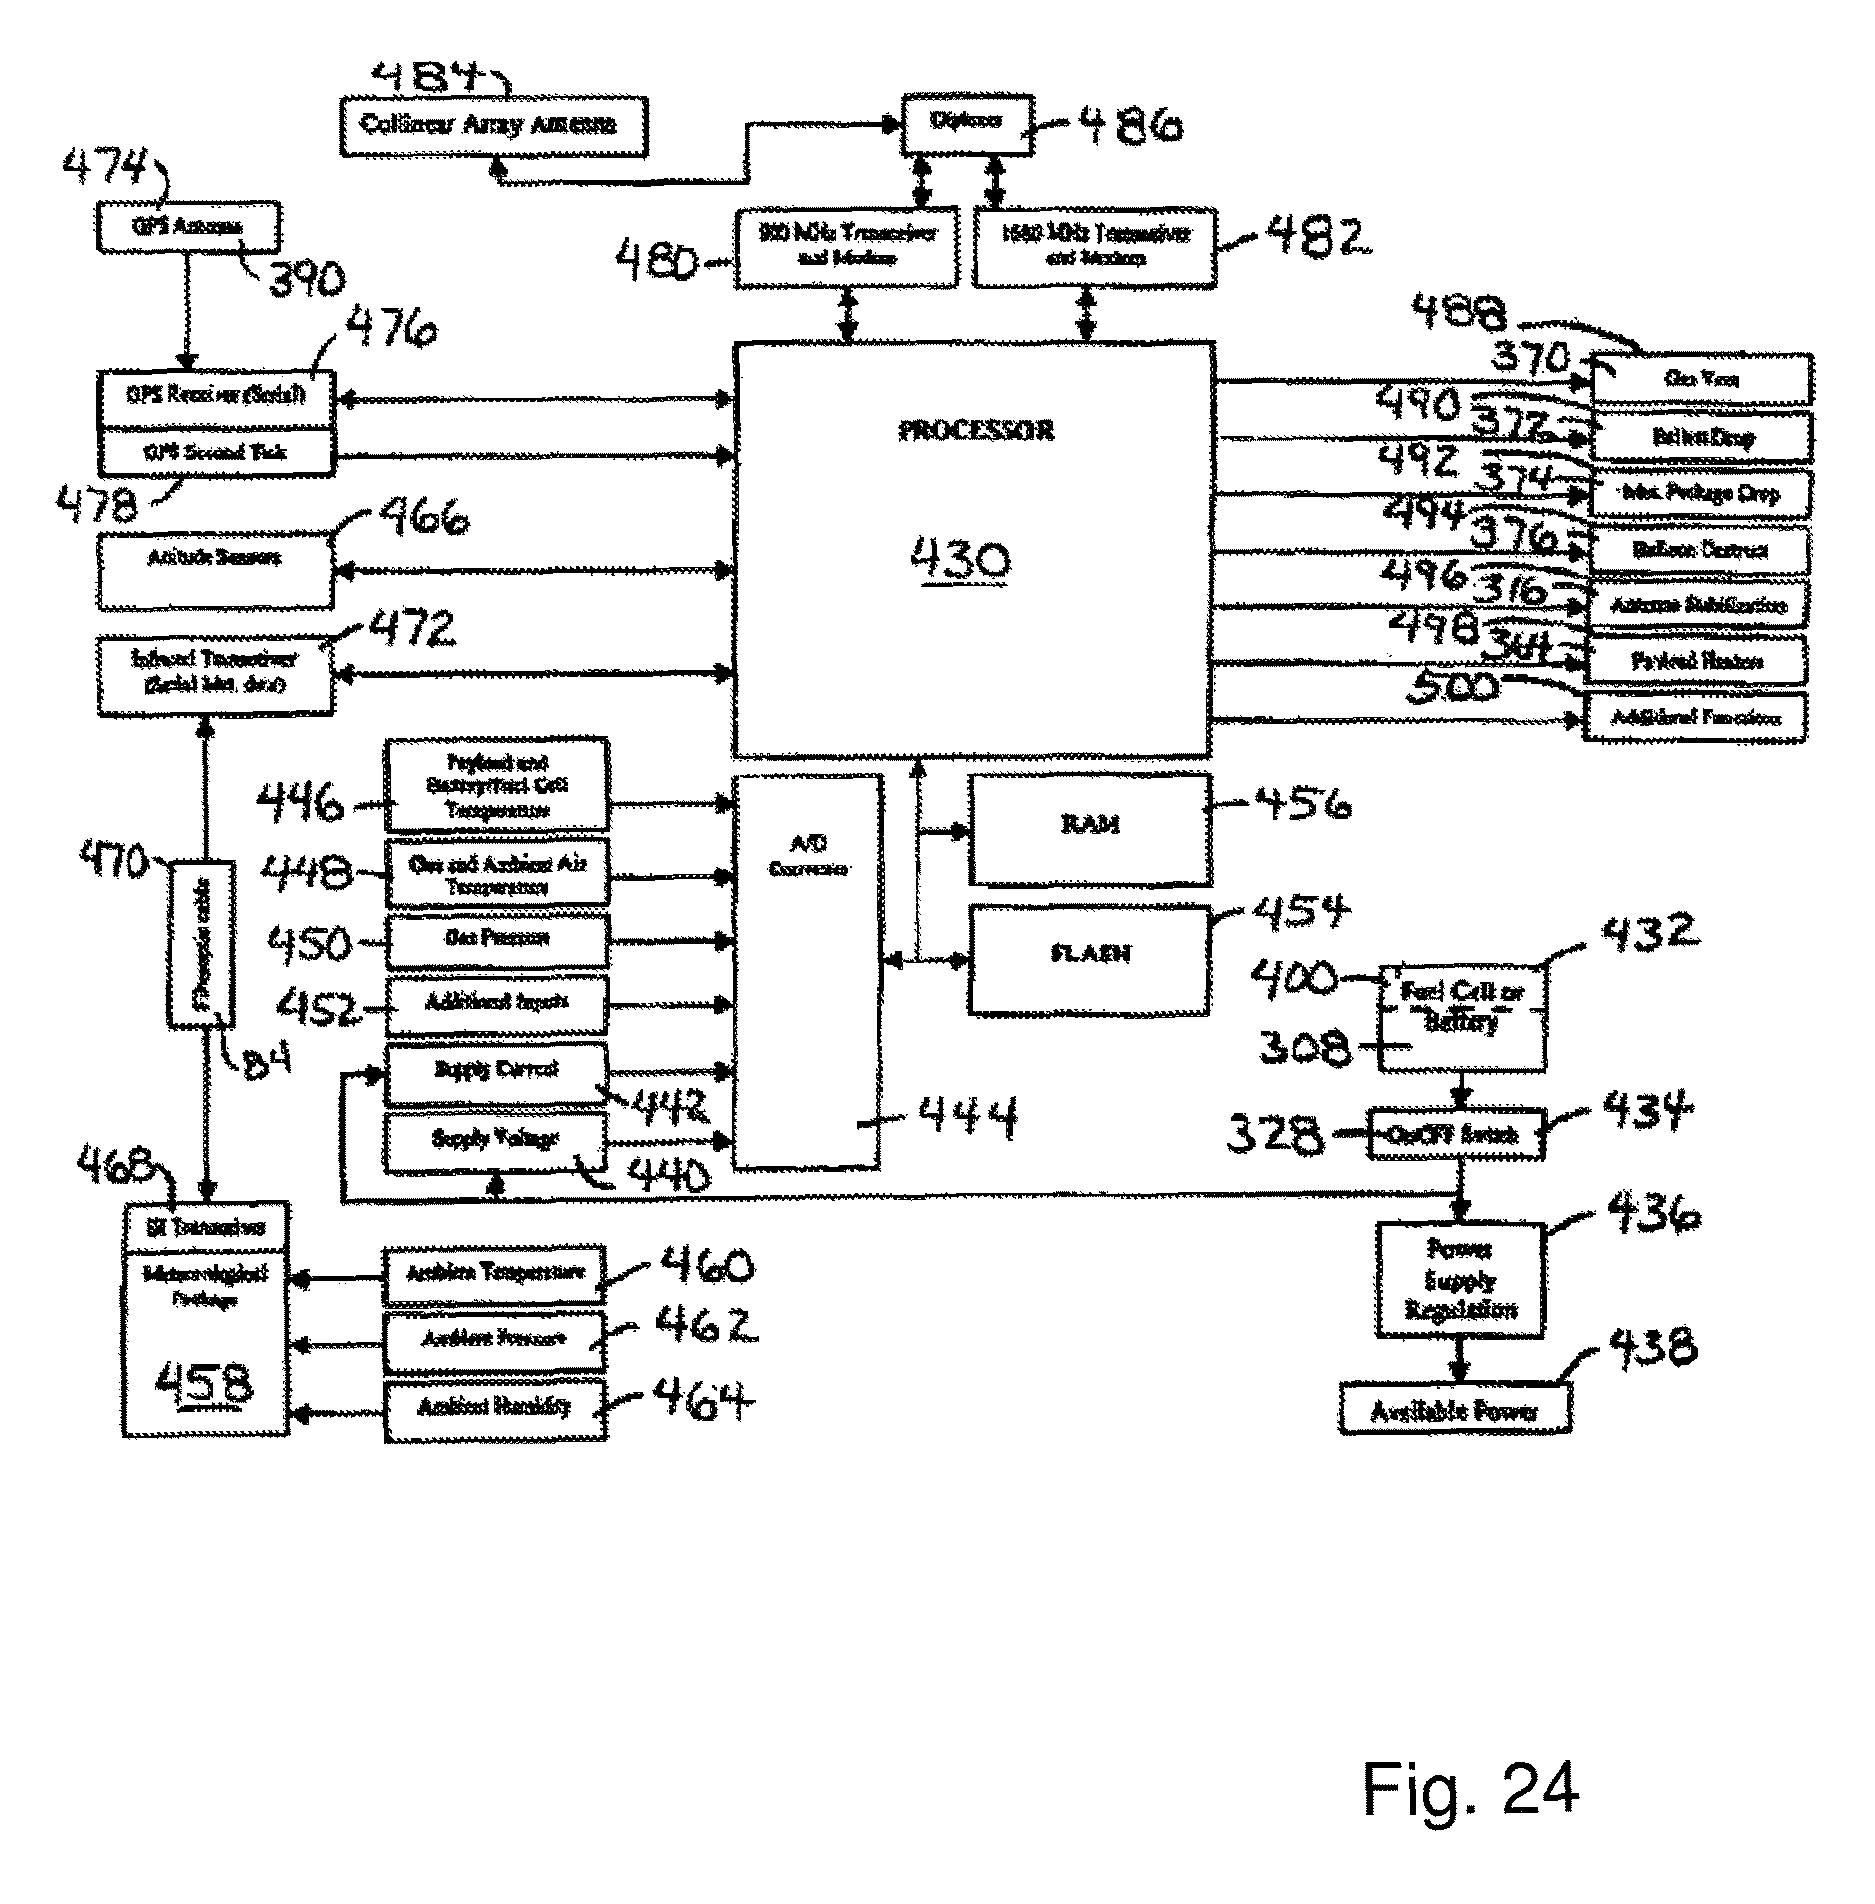 Patent US 9,678,193 B2